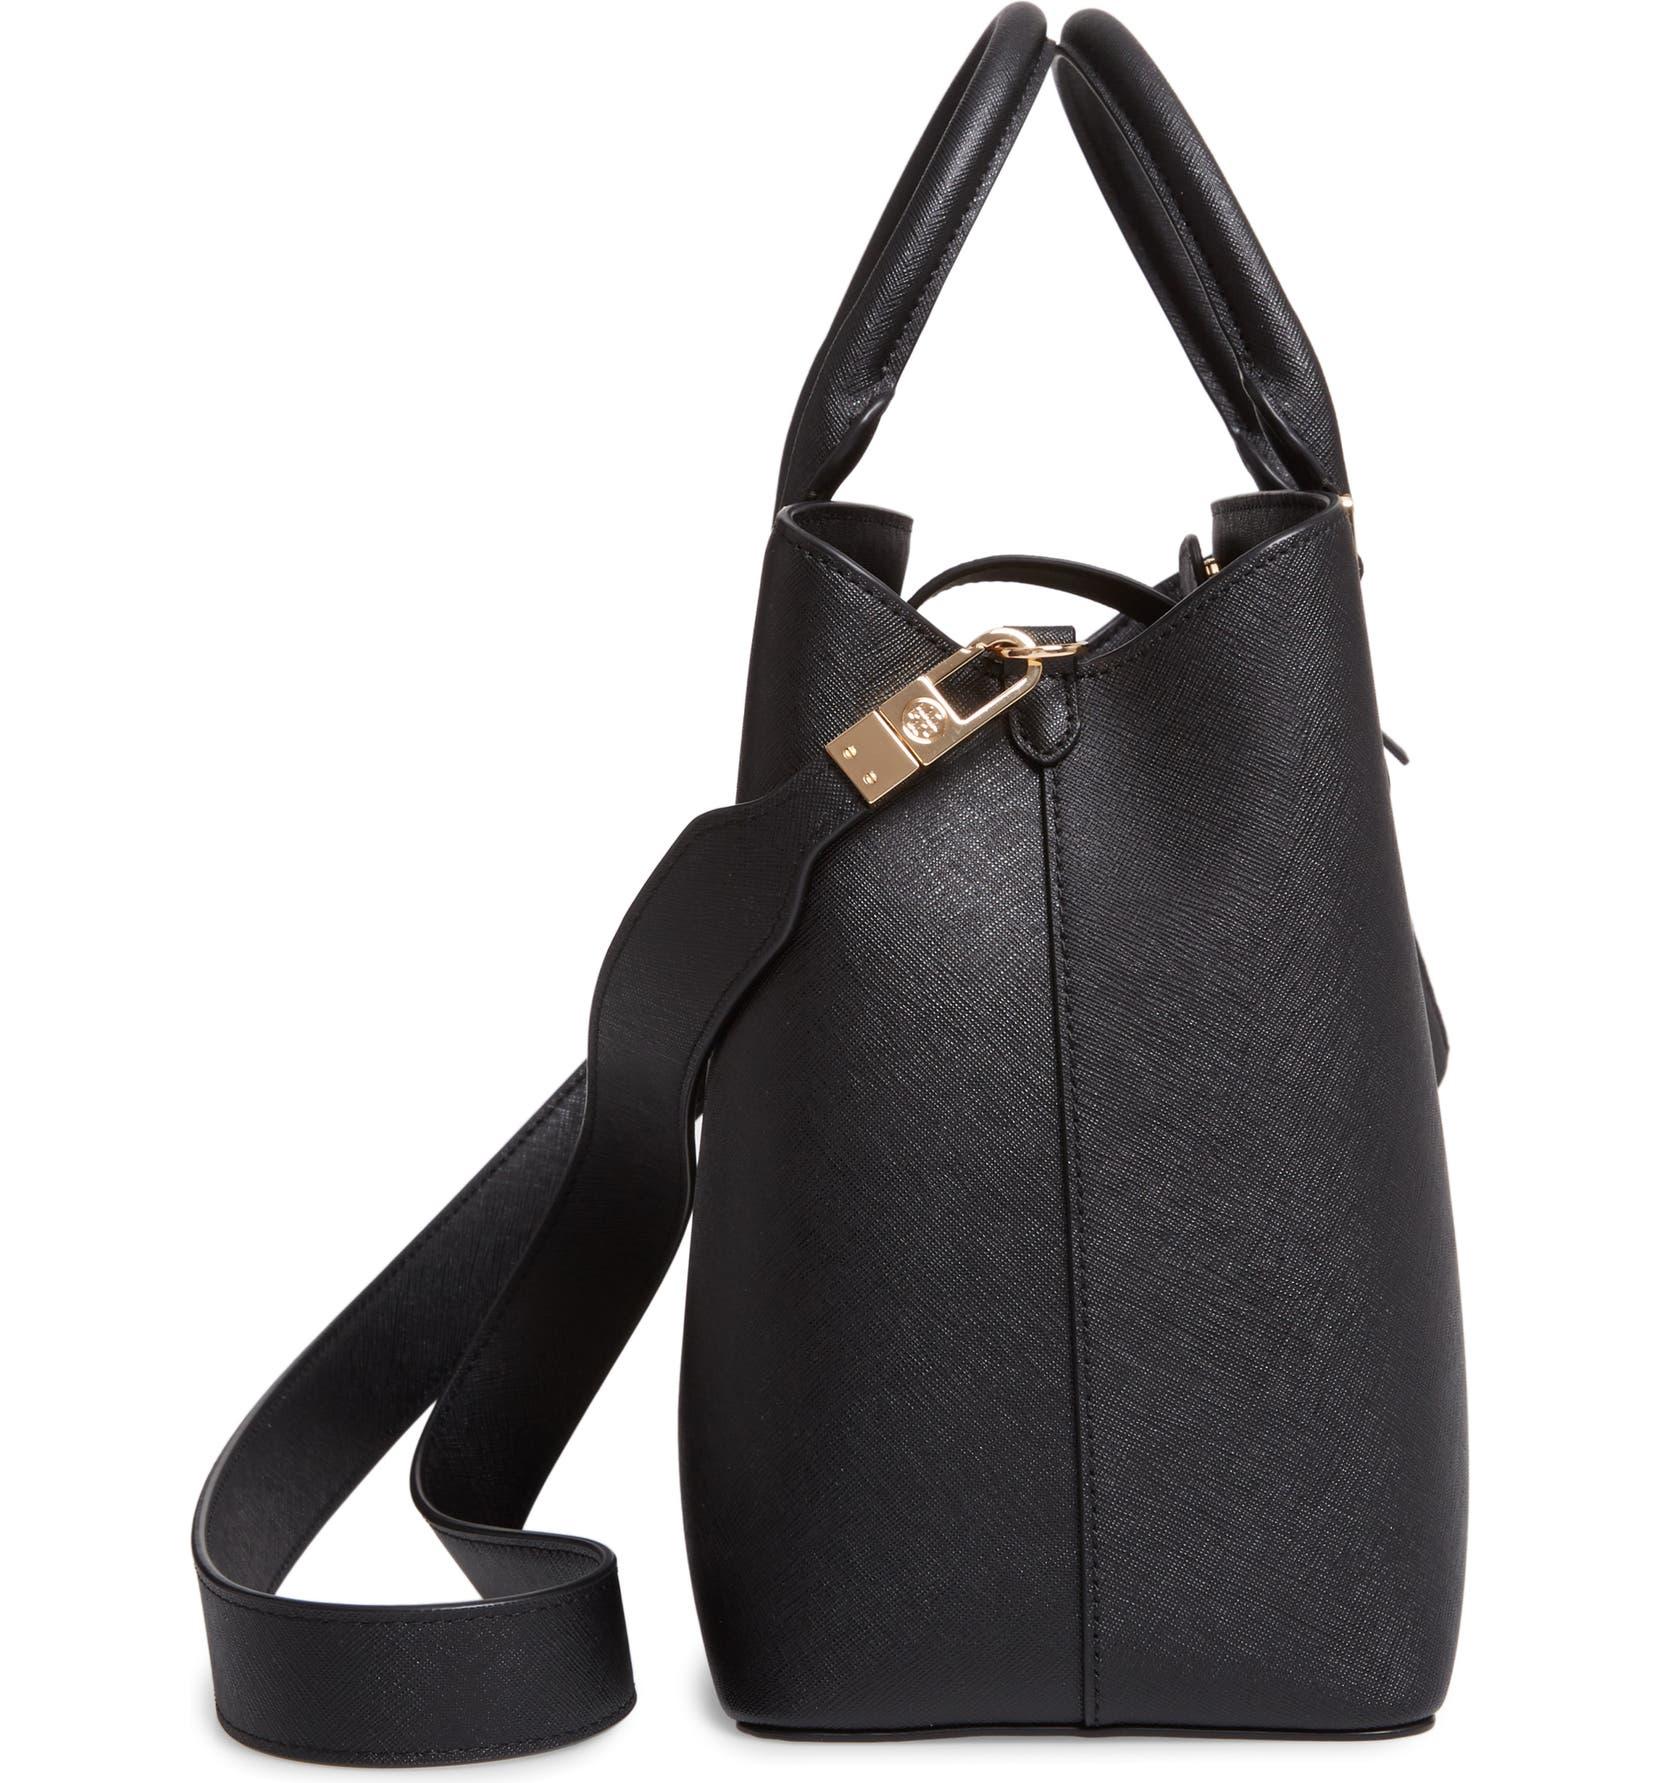 88f7f462e01 Tory Burch Medium Robinson Leather Triple Compartment Bag